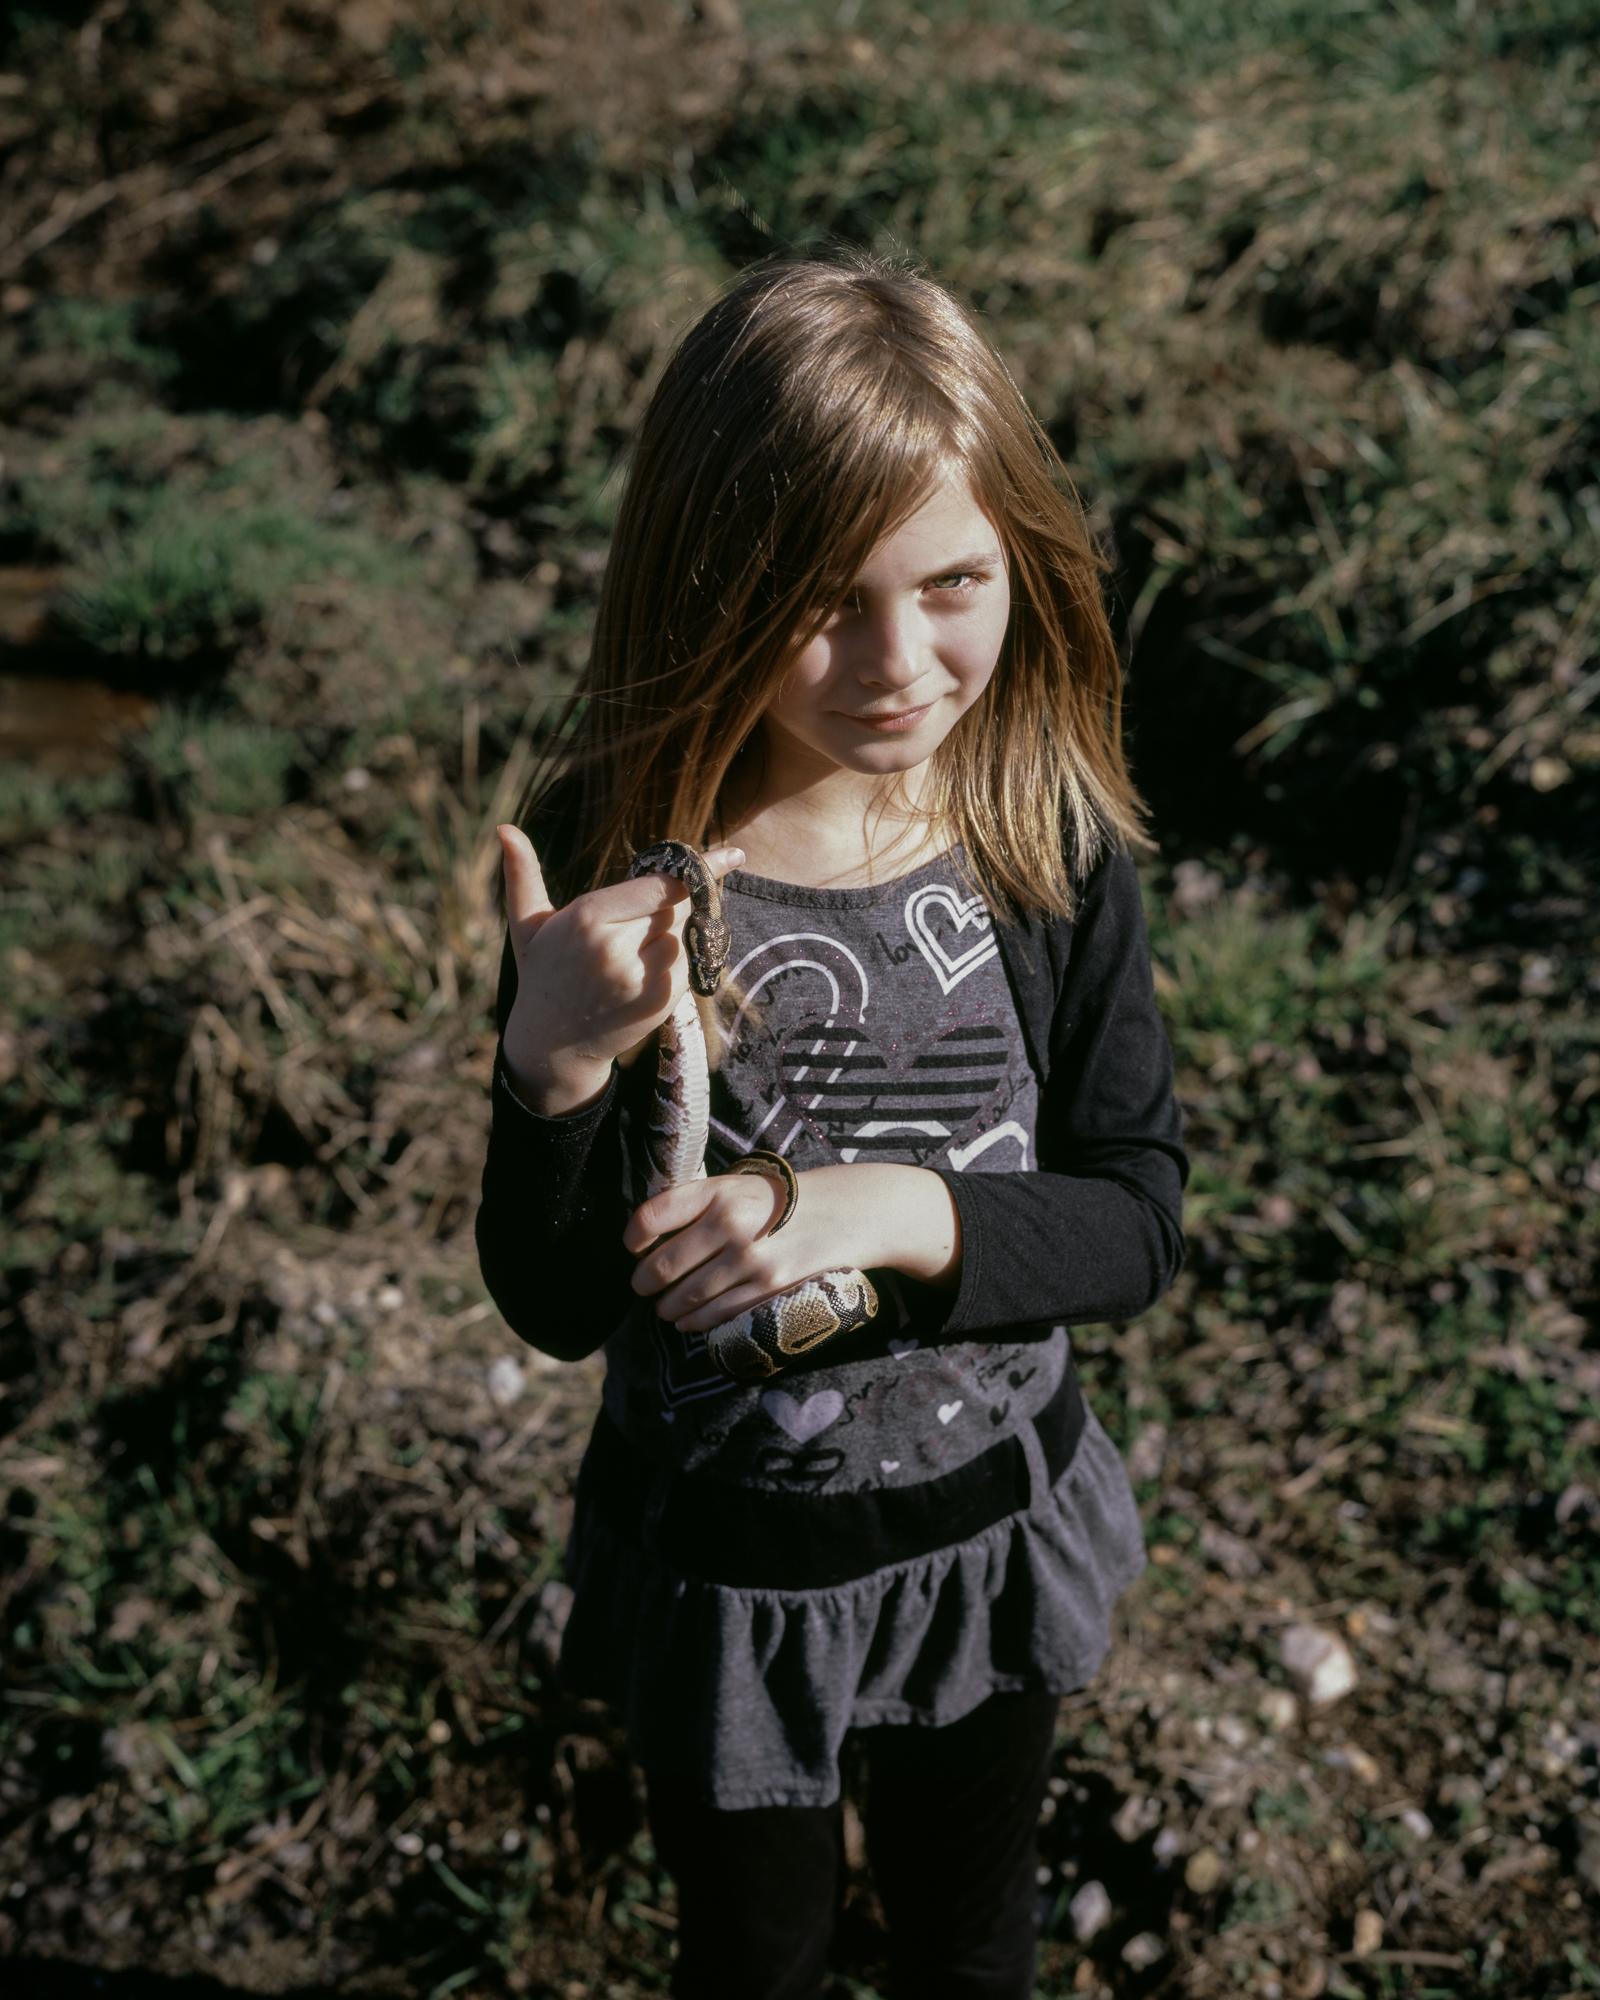 06-Brittainy-Lauback-charmers-18.jpg